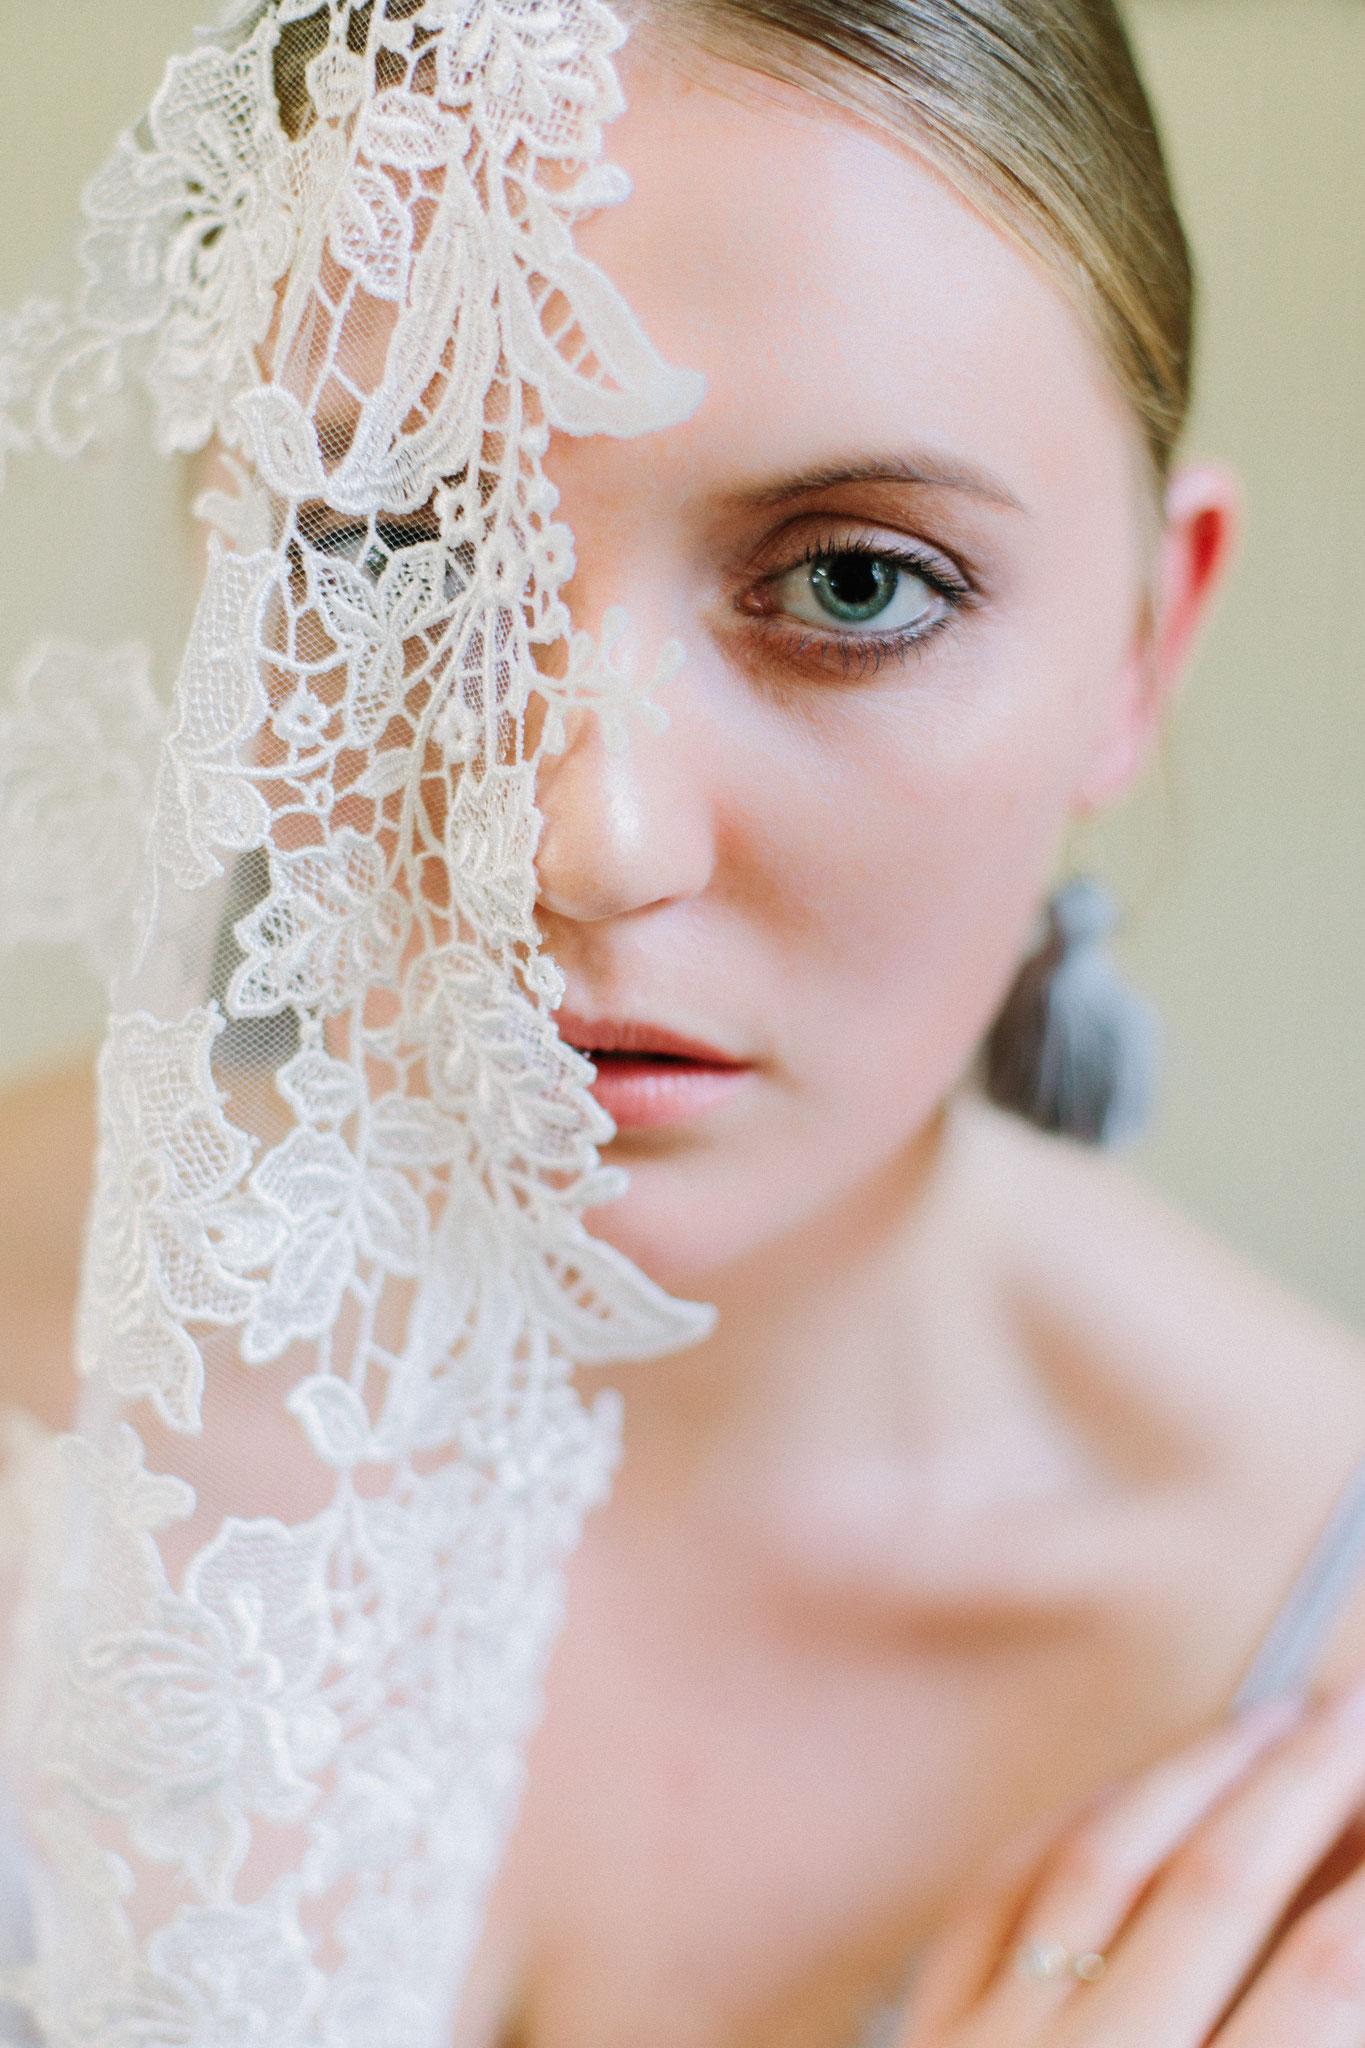 H&M: Atelier Maskerade | Foto: Julia Sloboda Photography